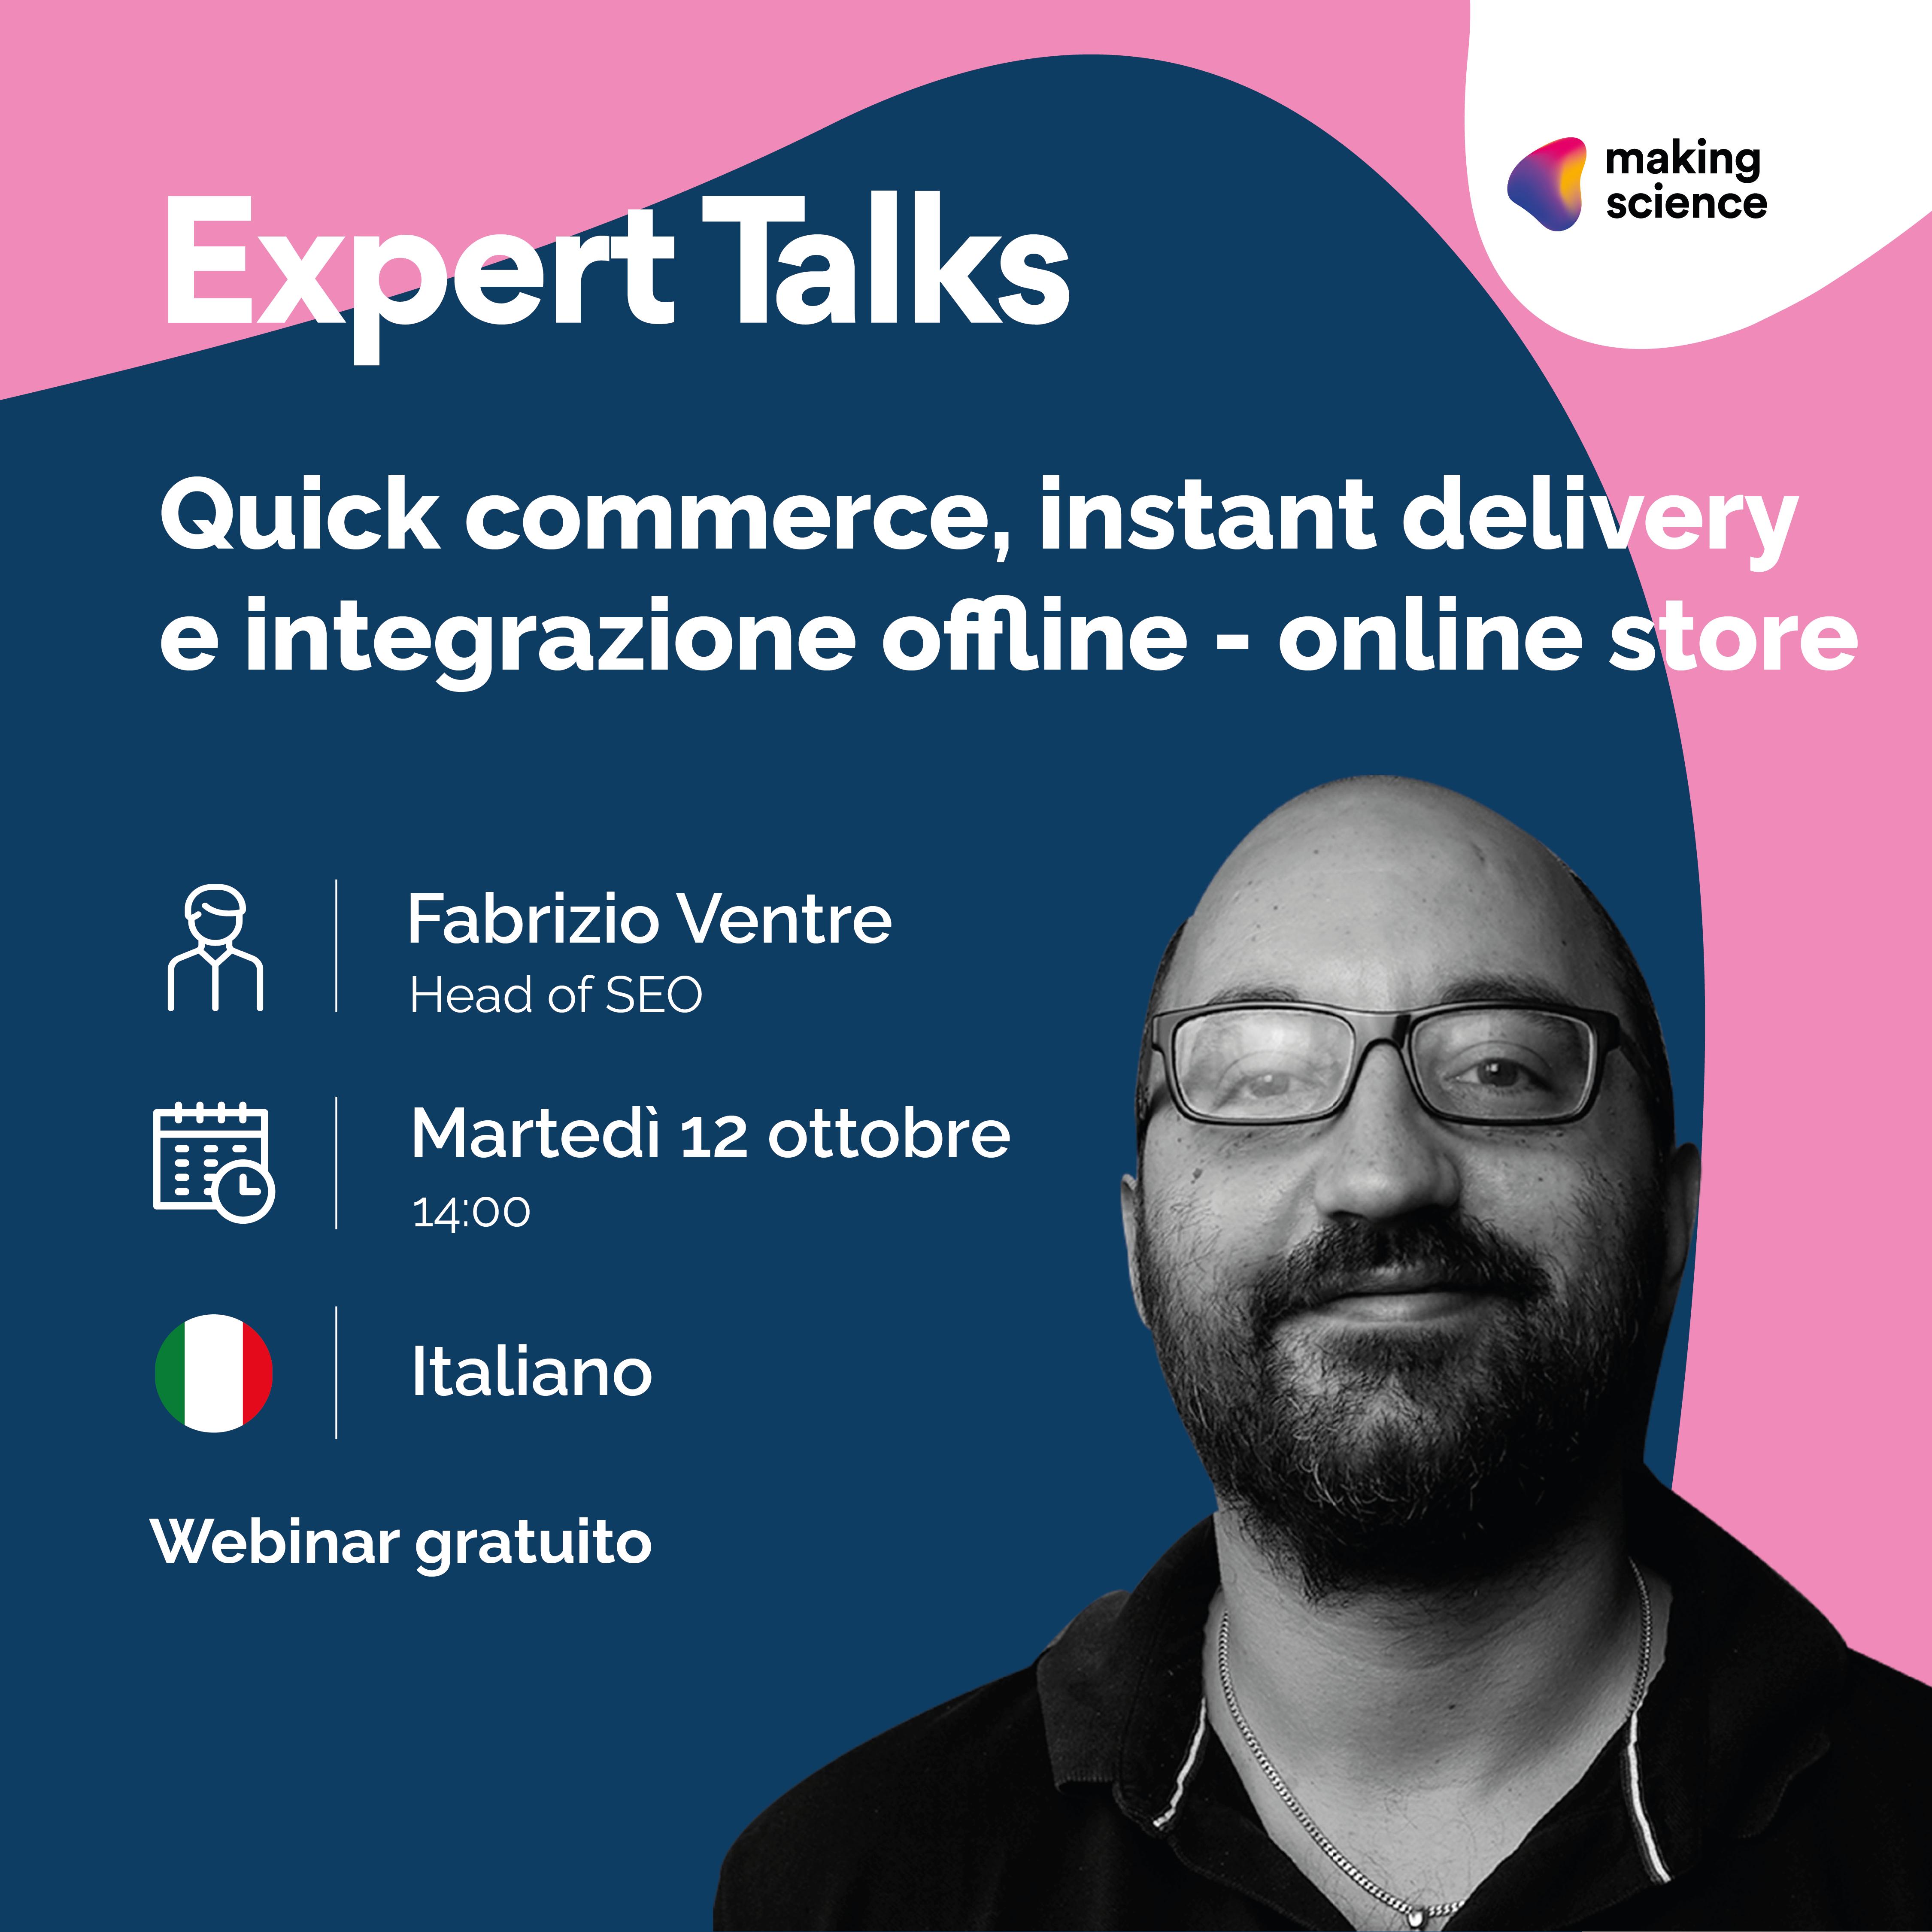 Quick commerce webinar